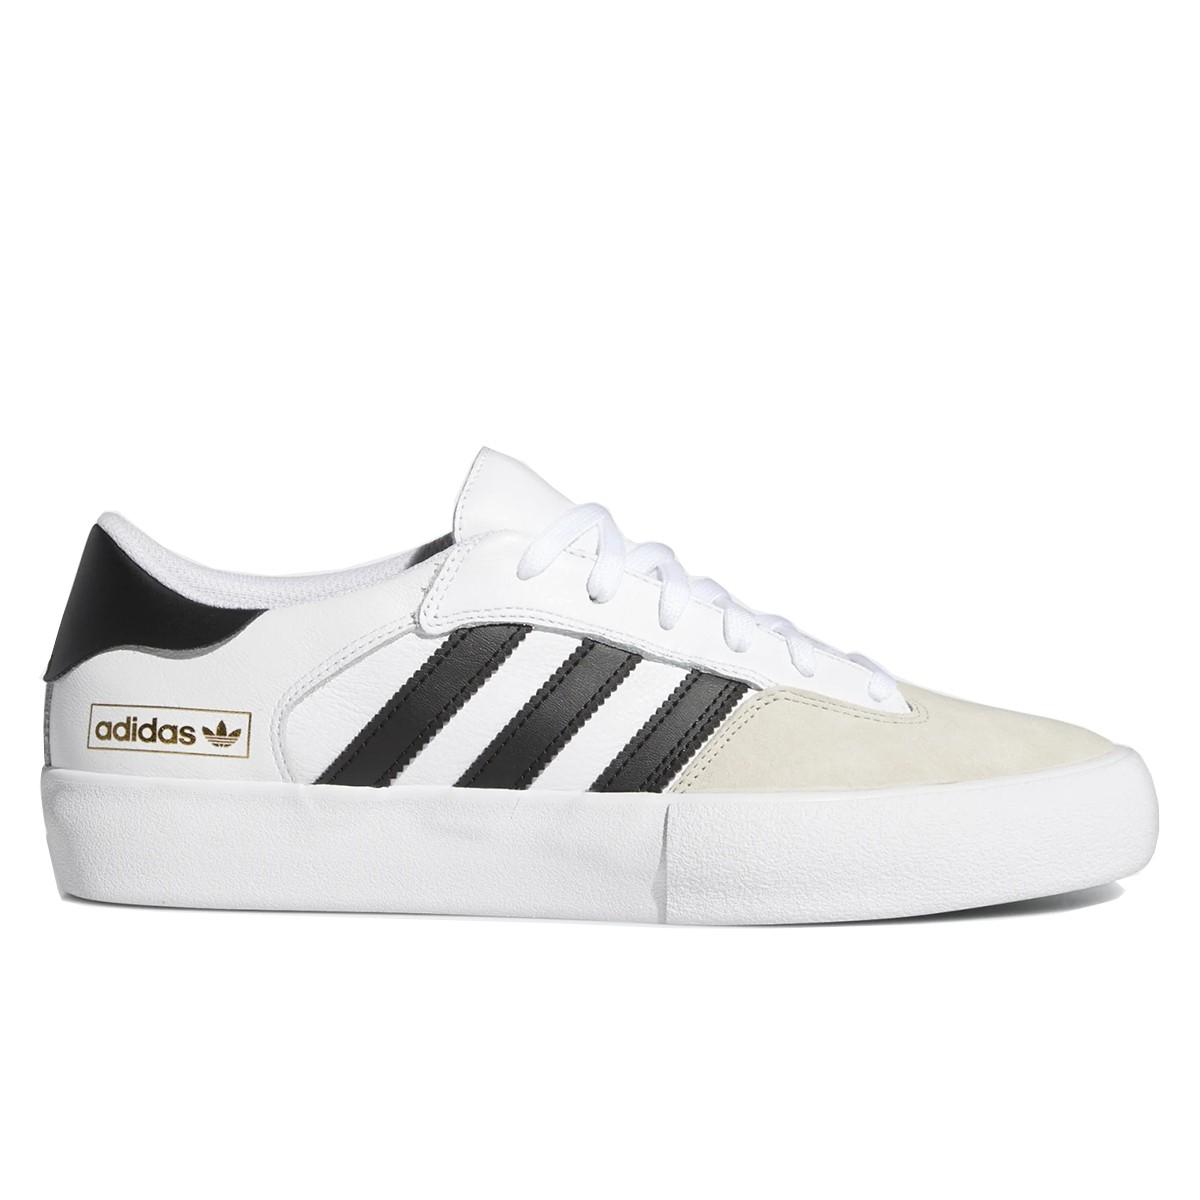 "ADIDAS ""Matchbreak Super"" white skate shoes 3 stripes black"